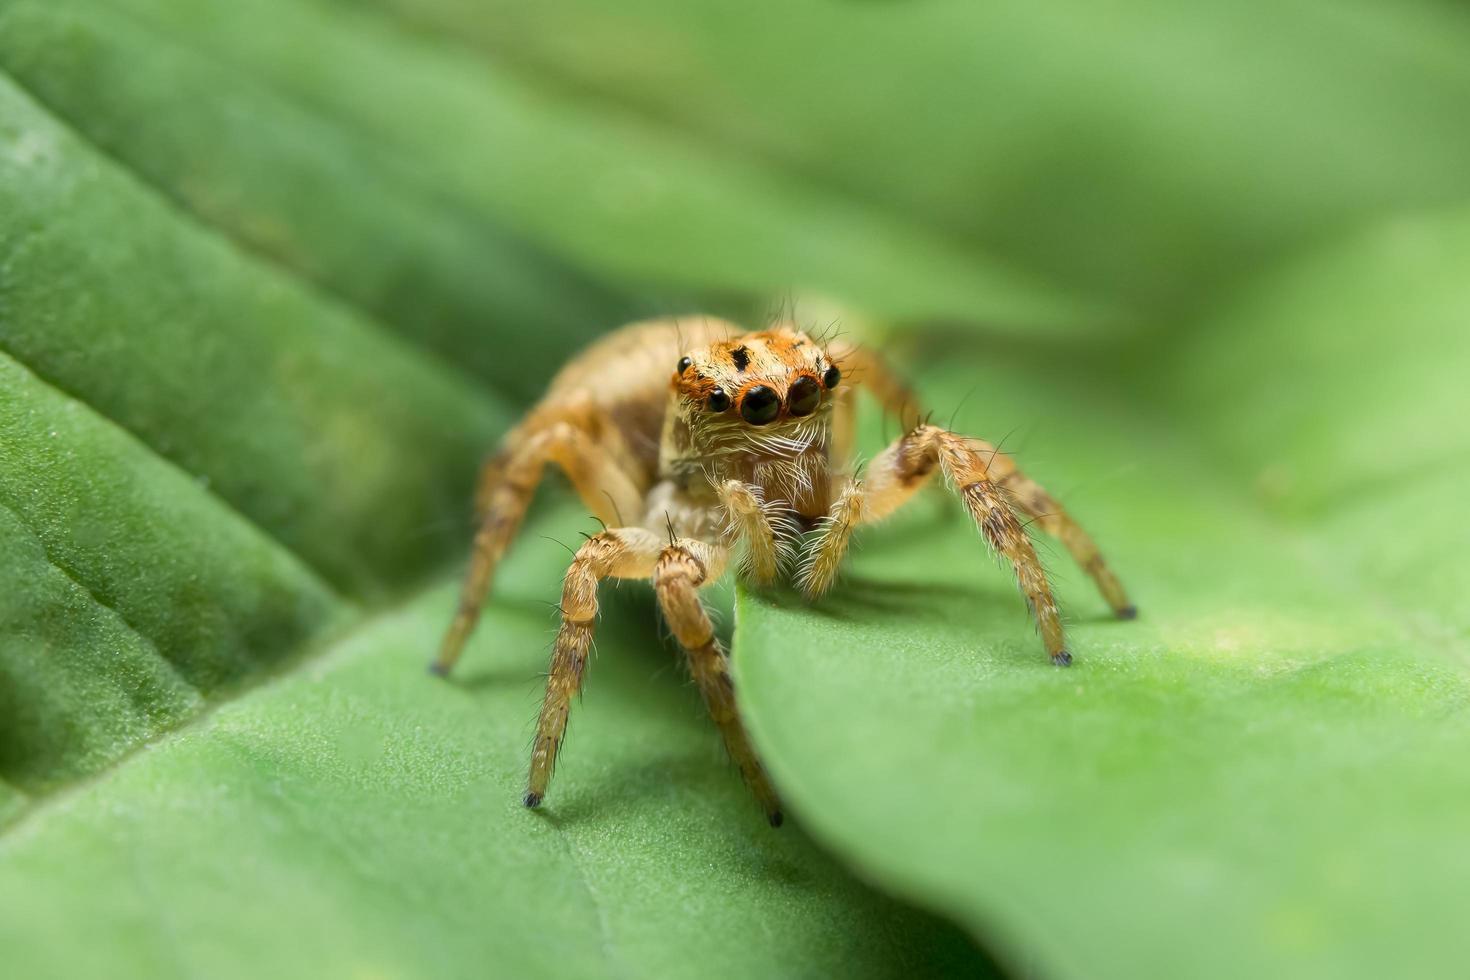 Brown spider on green leaf photo